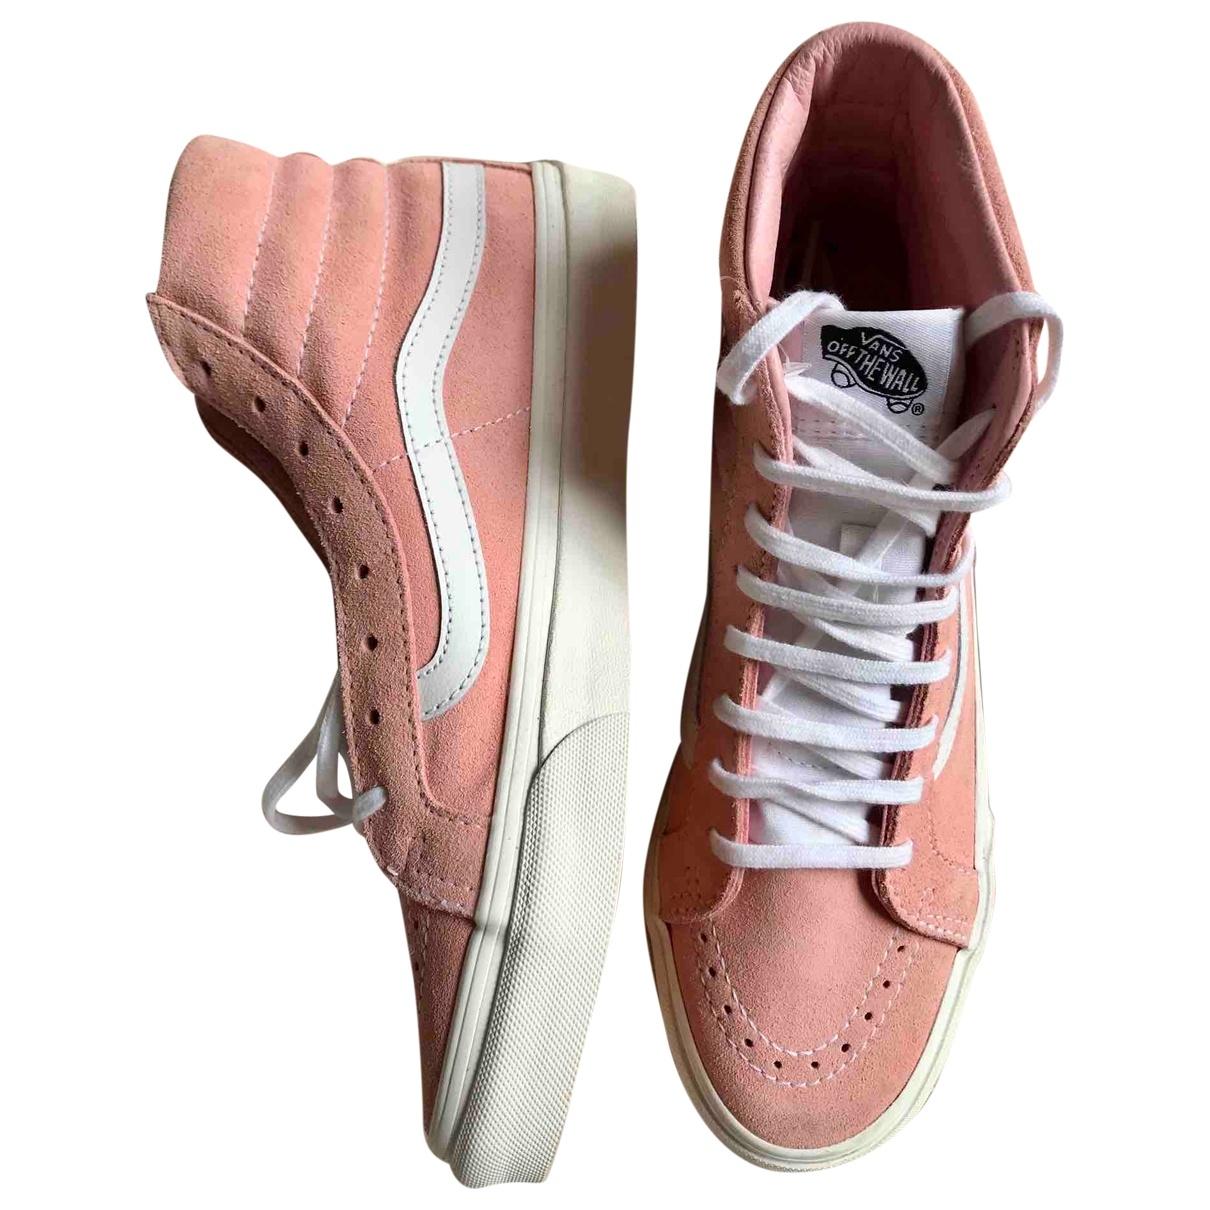 Vans \N Pink Suede Trainers for Women 6 UK